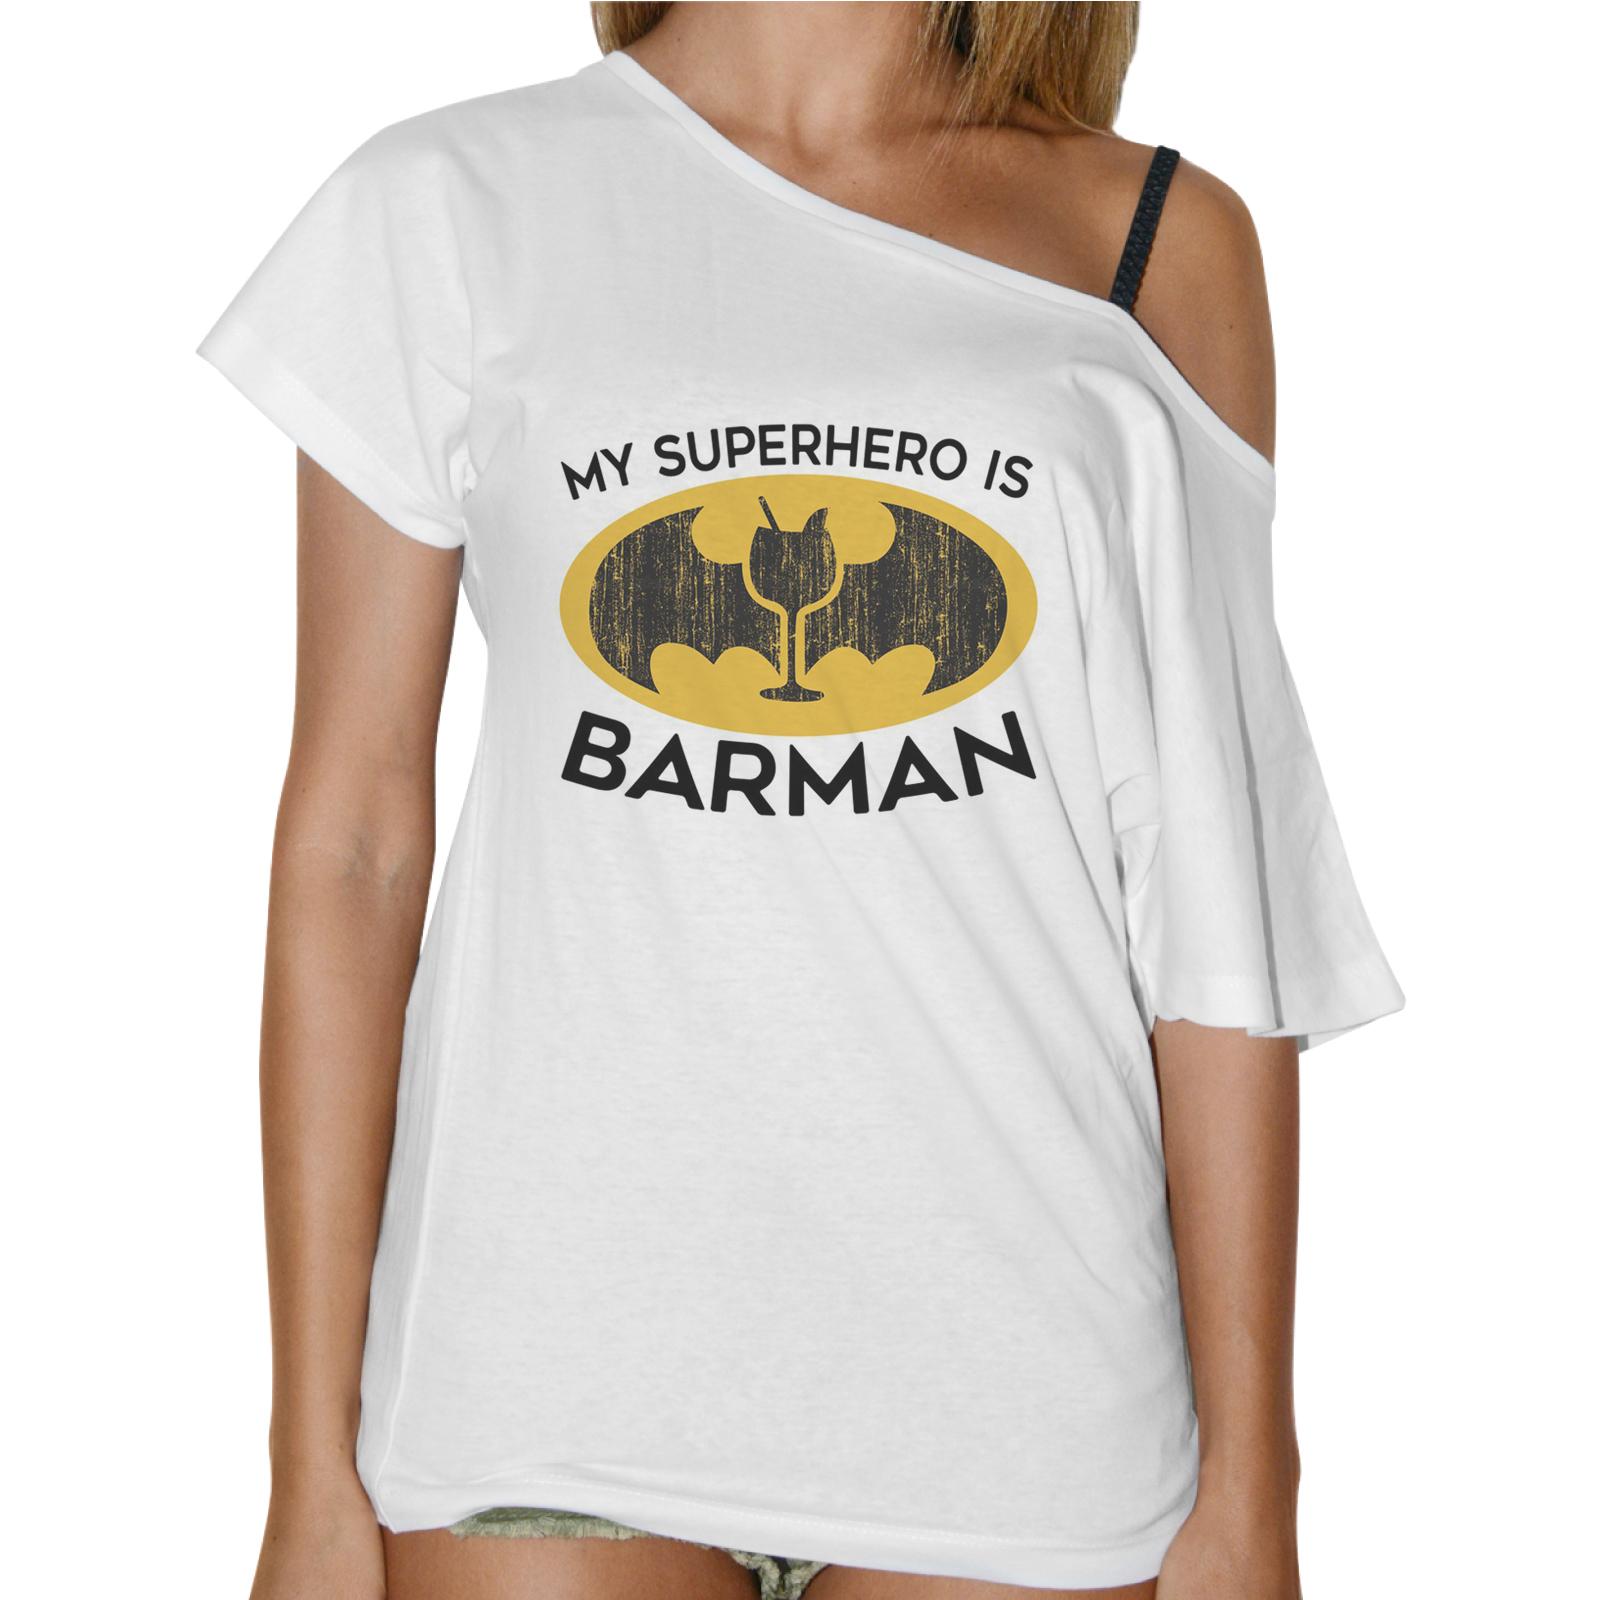 T-Shirt Donna Collo Barca SUPERHERO BARMAN